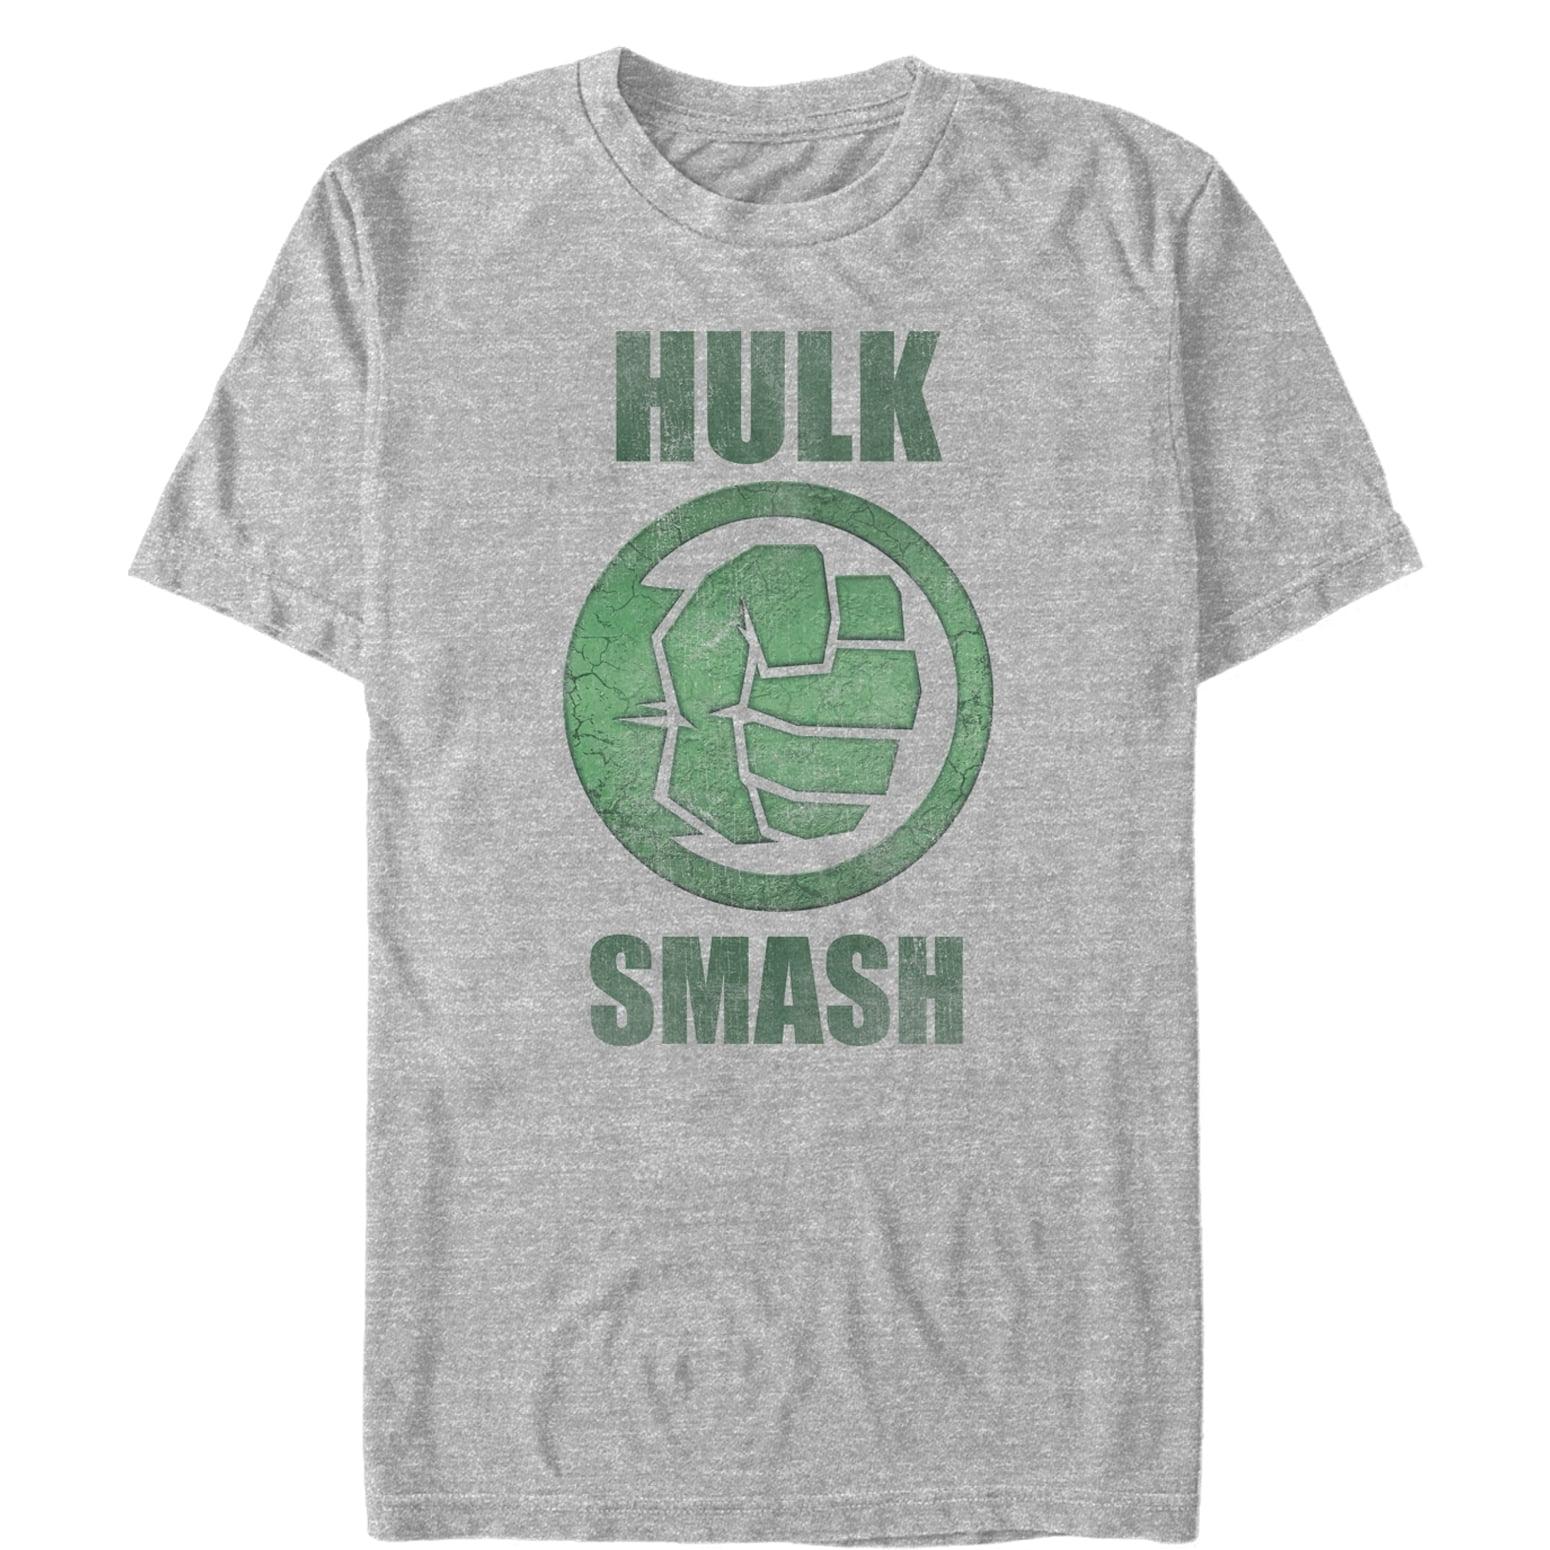 Marvel Men's Hulk Smash T-Shirt